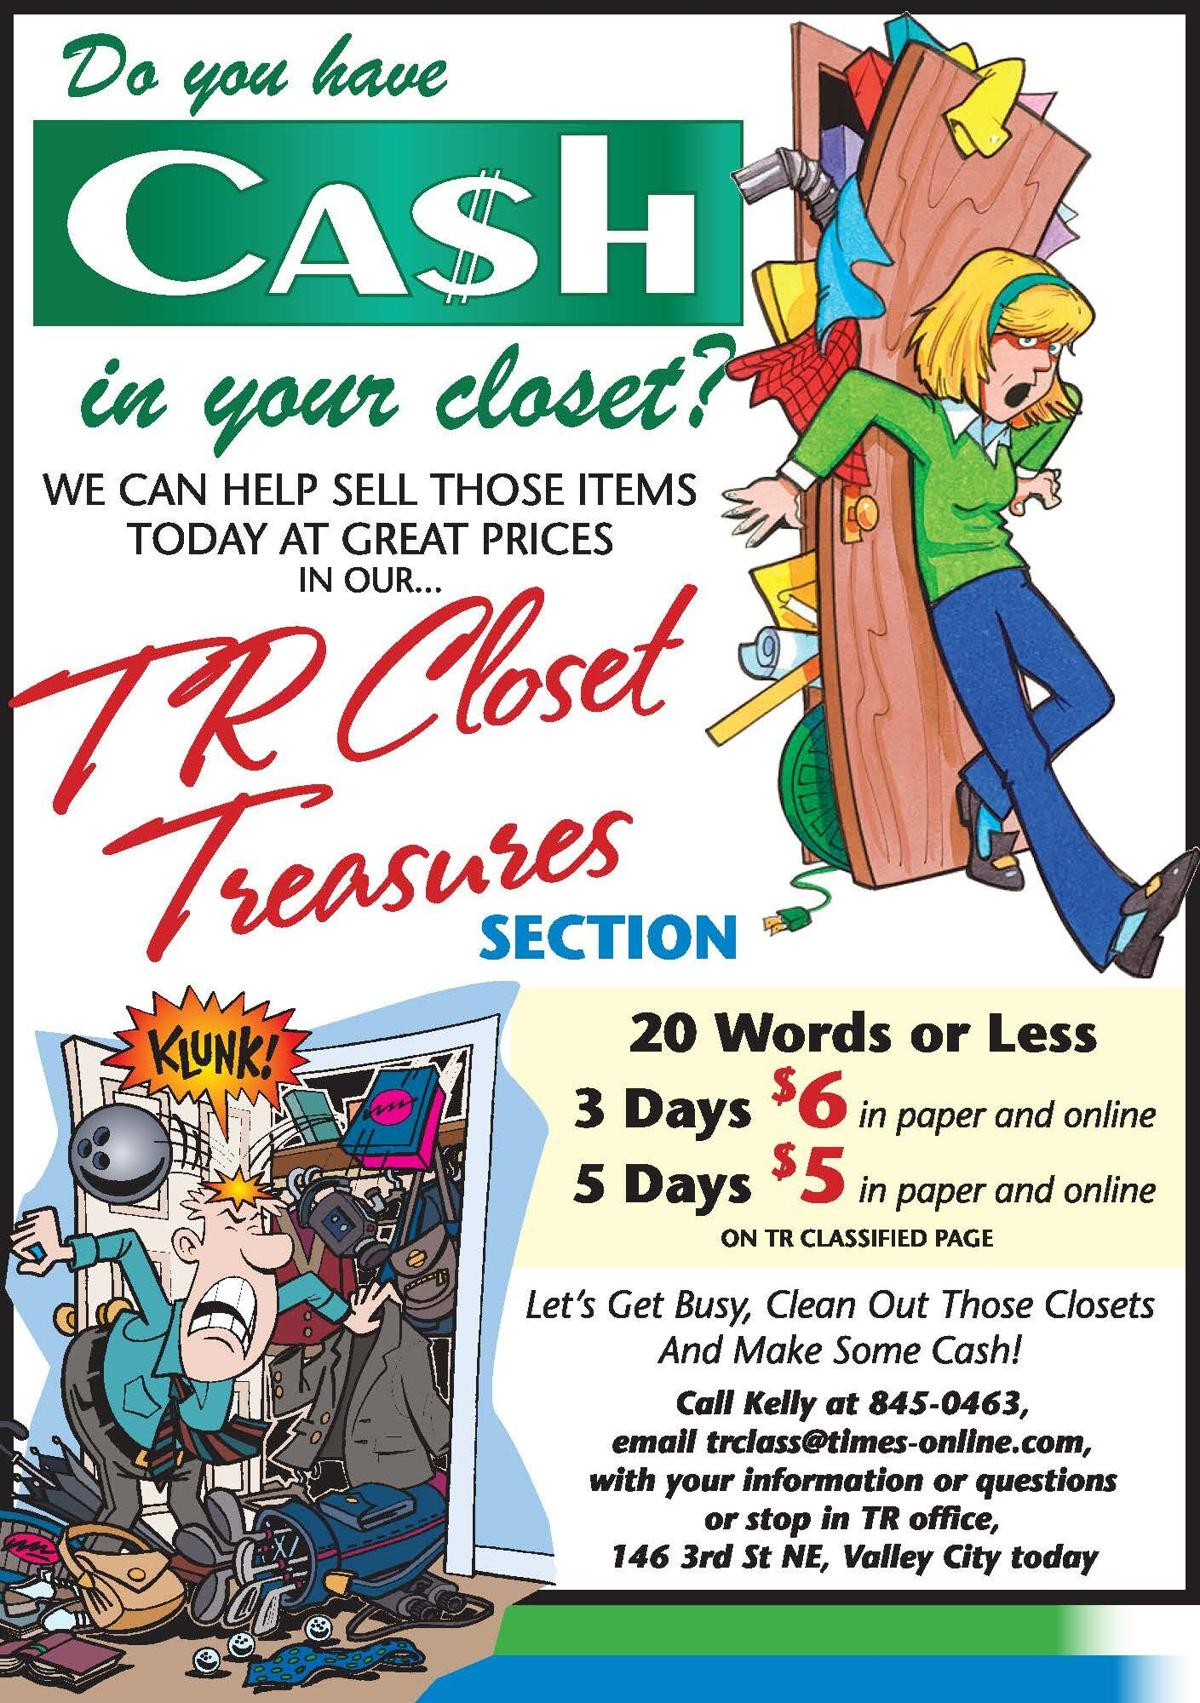 Closet Treasures